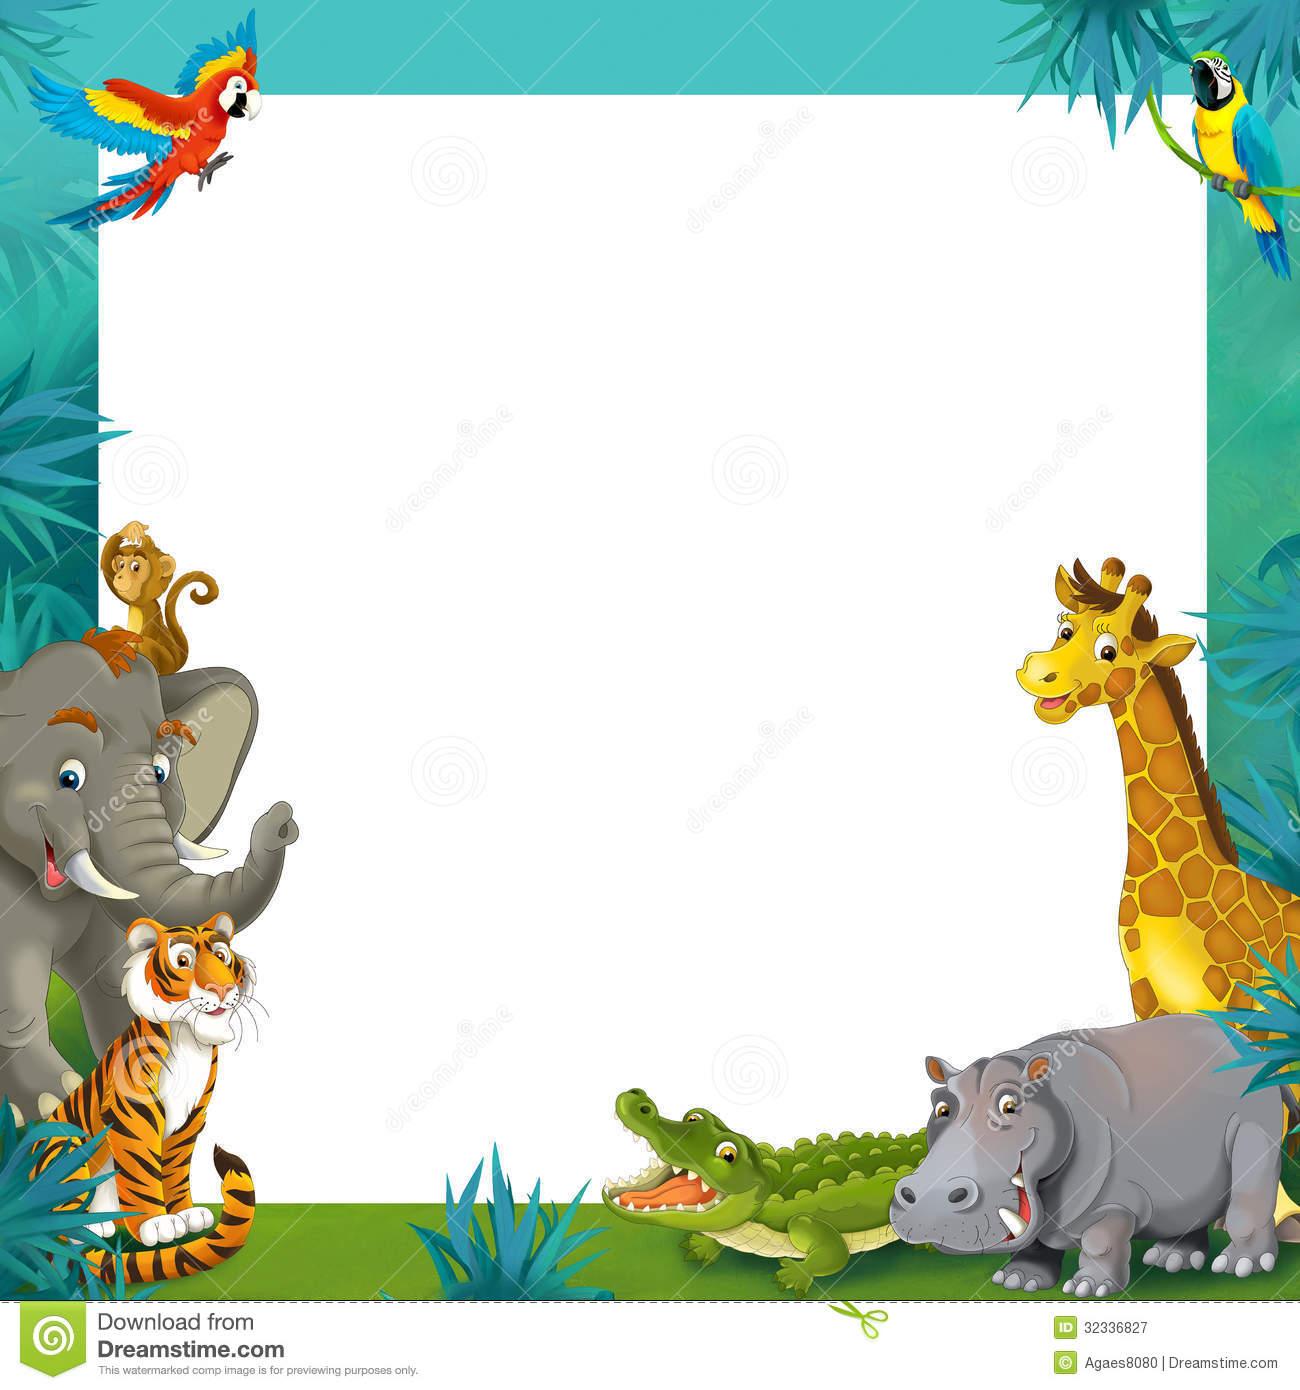 Wildlife Border Cliparts Free Download Clip Art.